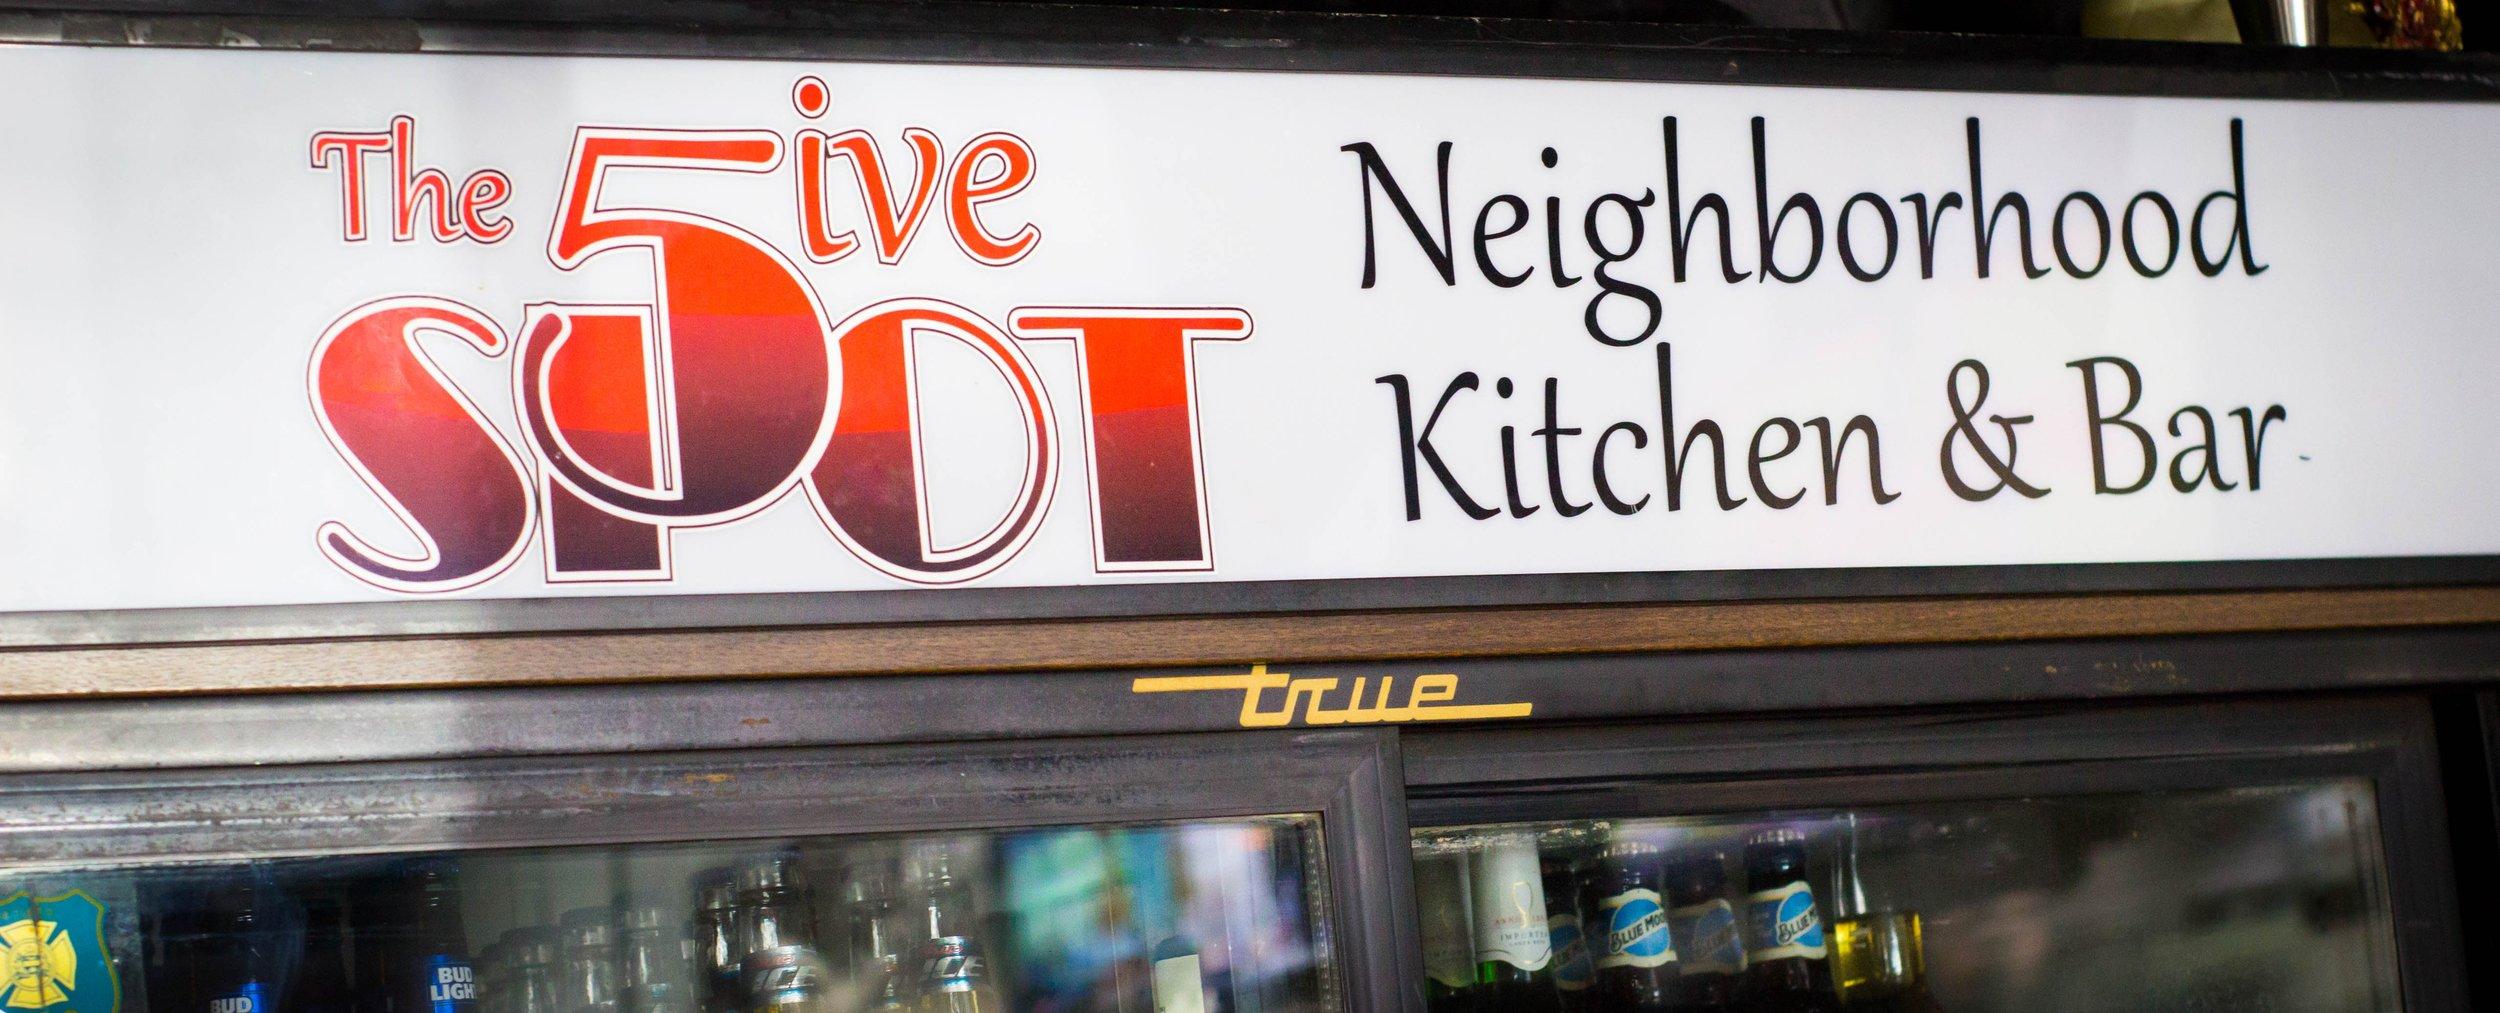 The 5ive spot Baltimore  ,  Five Spot Randallstown, MD